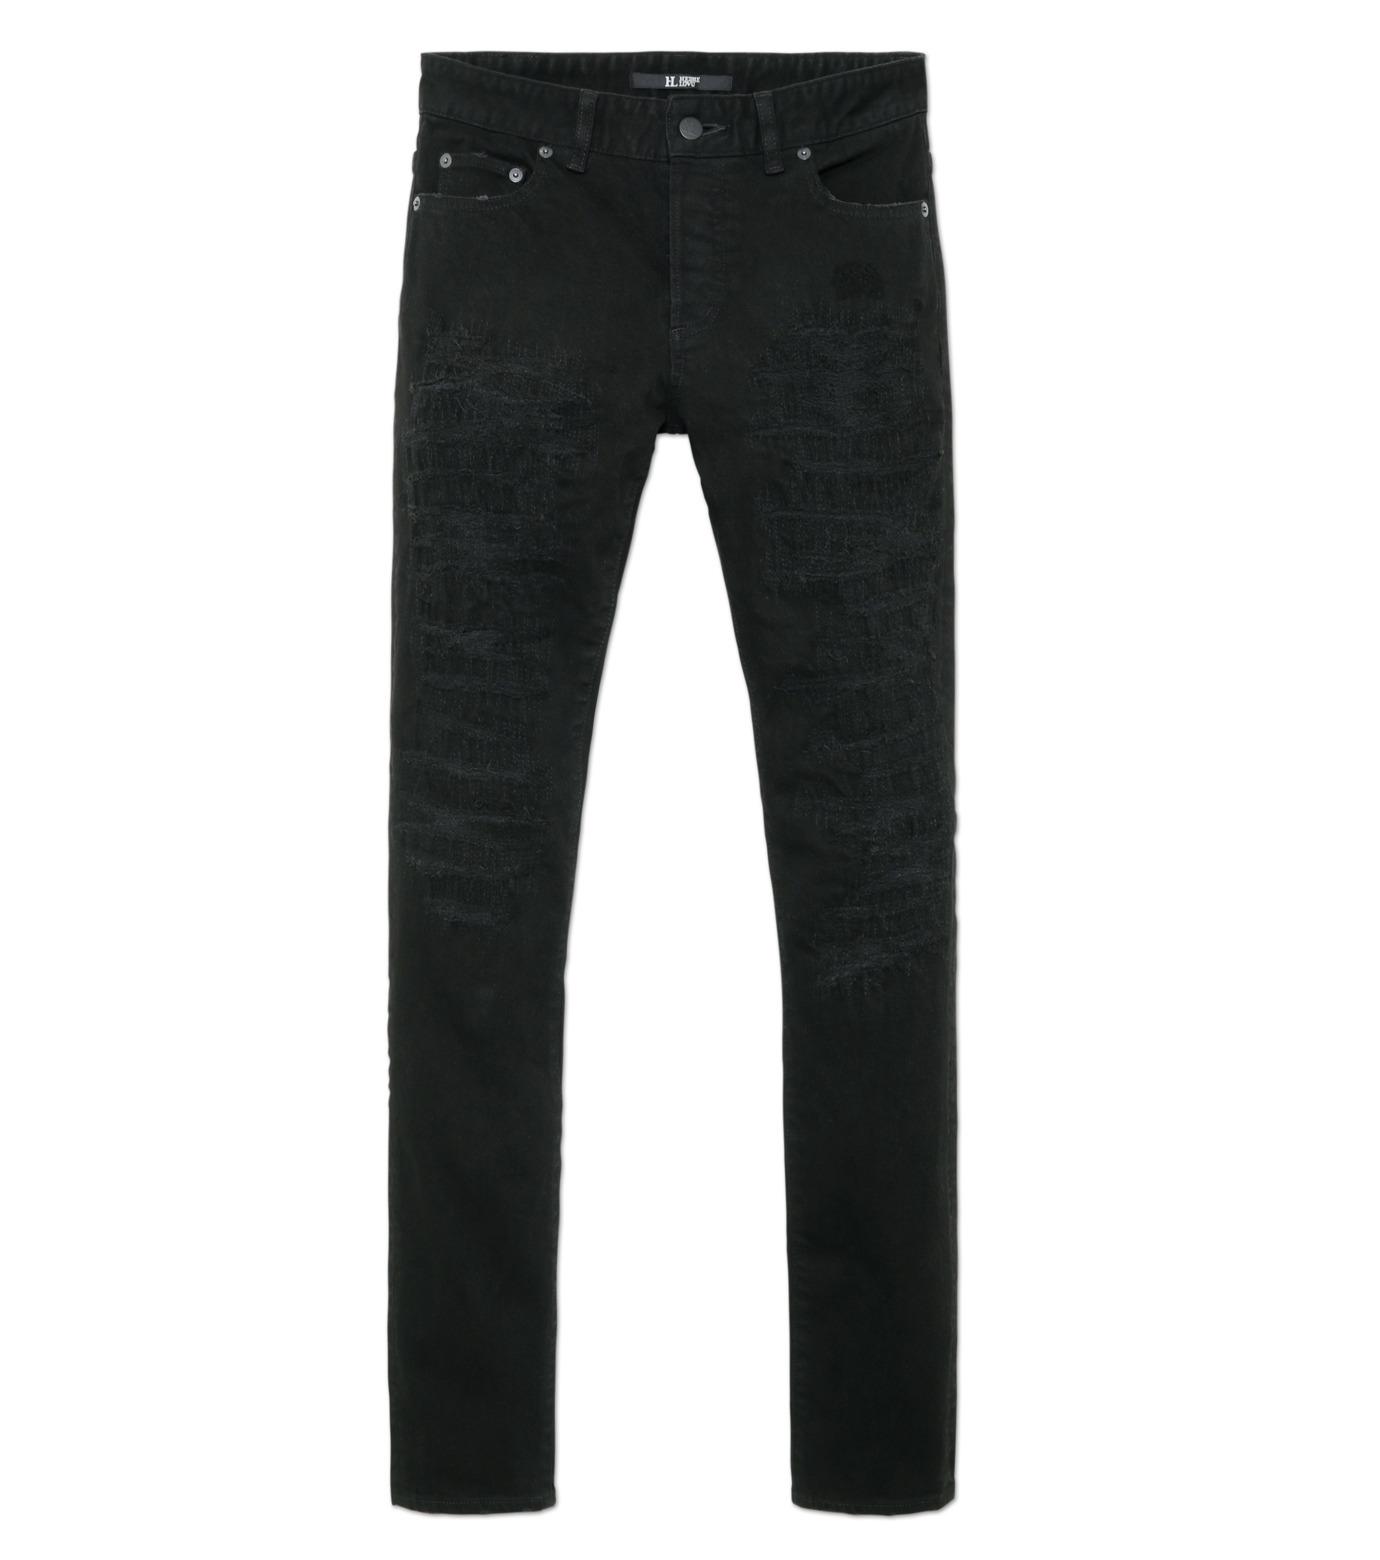 HL HEDDIE LOVU(エイチエル・エディールーヴ)のblk damage3 skin slim-BLACK(パンツ/pants)-18S98003-13 拡大詳細画像4